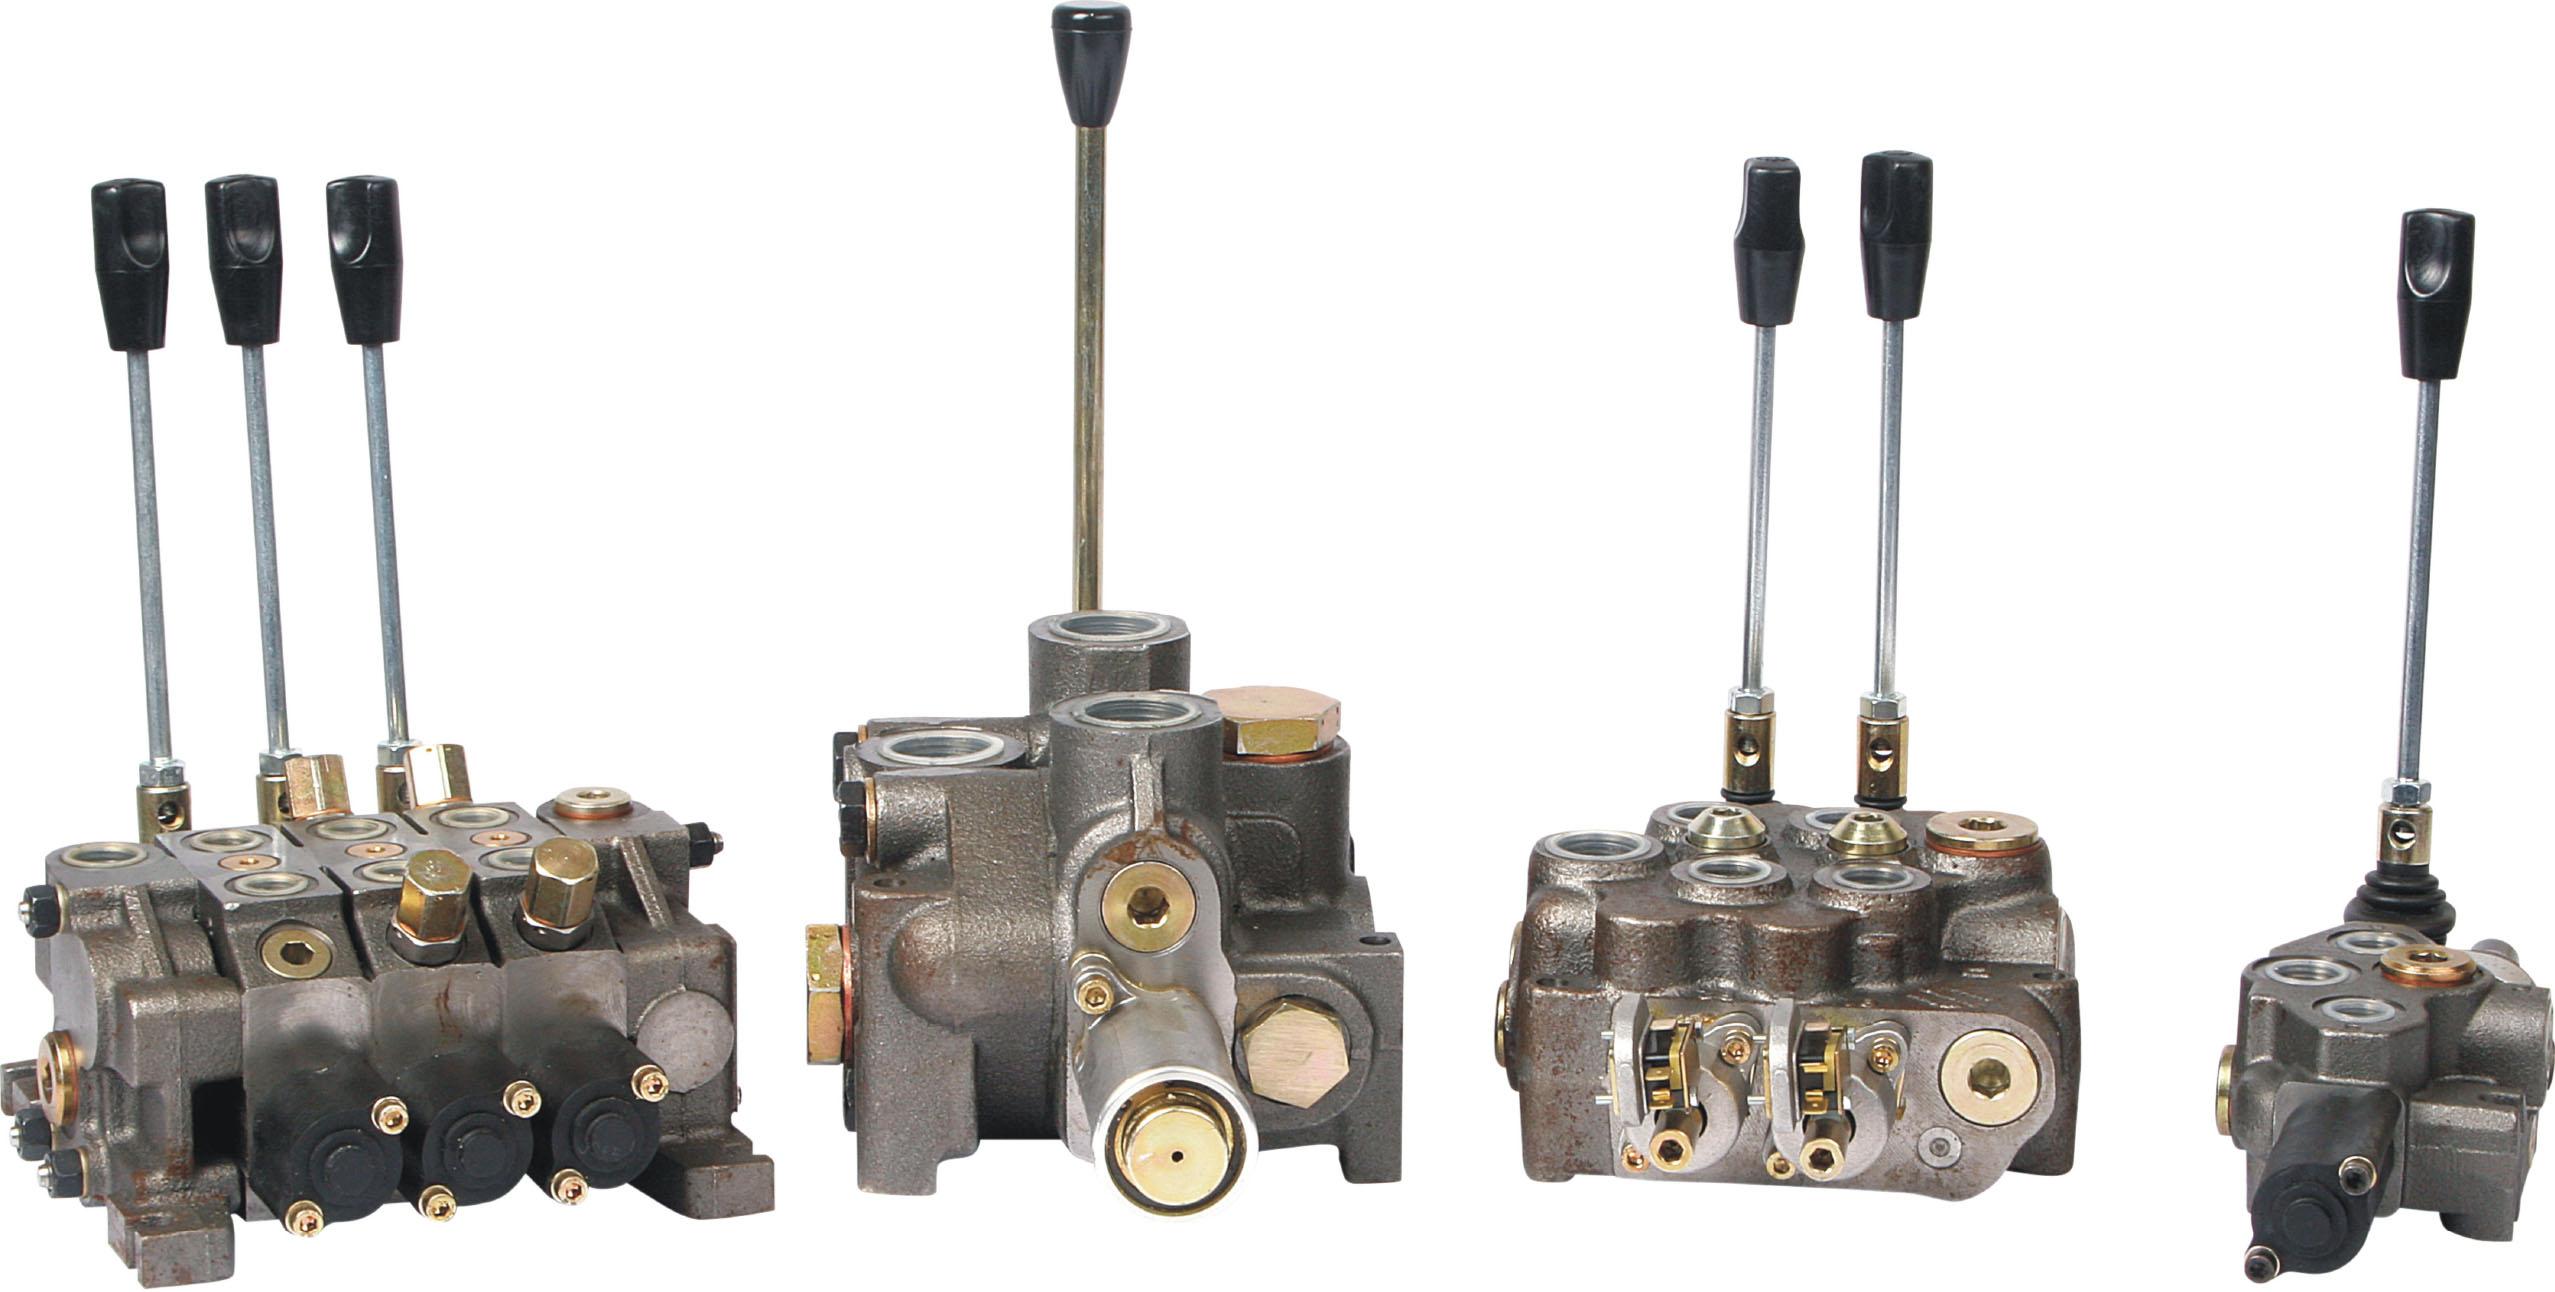 http://jumbosan.com.tr/wp-content/uploads/hydrolic-systems-jumbosan-machine-spare-parts.jpg